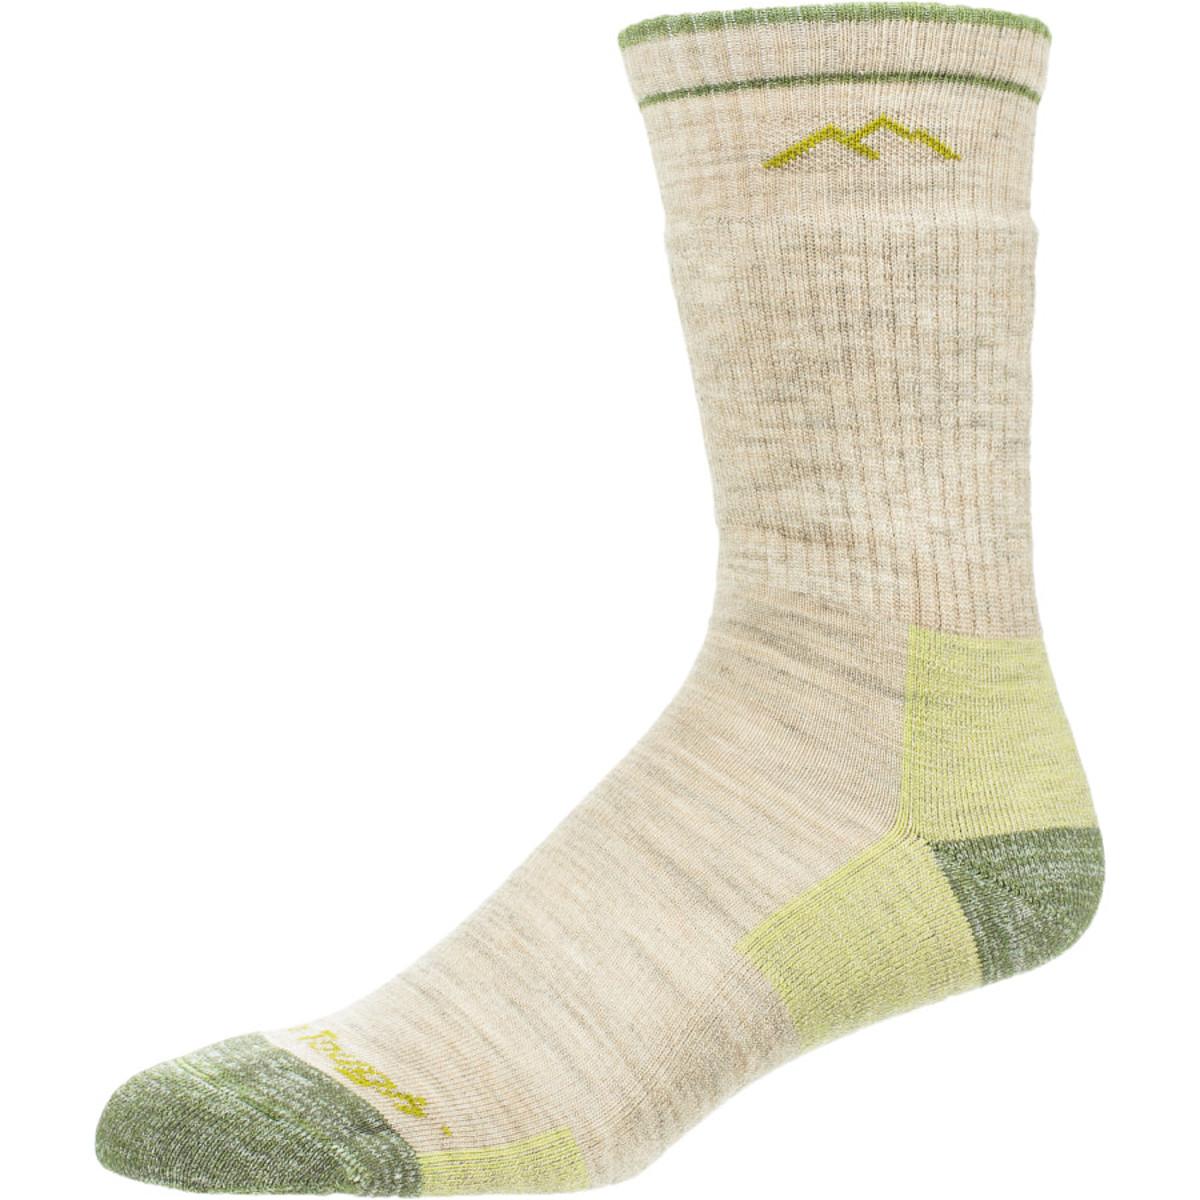 Darn Tough Merino Boot Sock Cushion